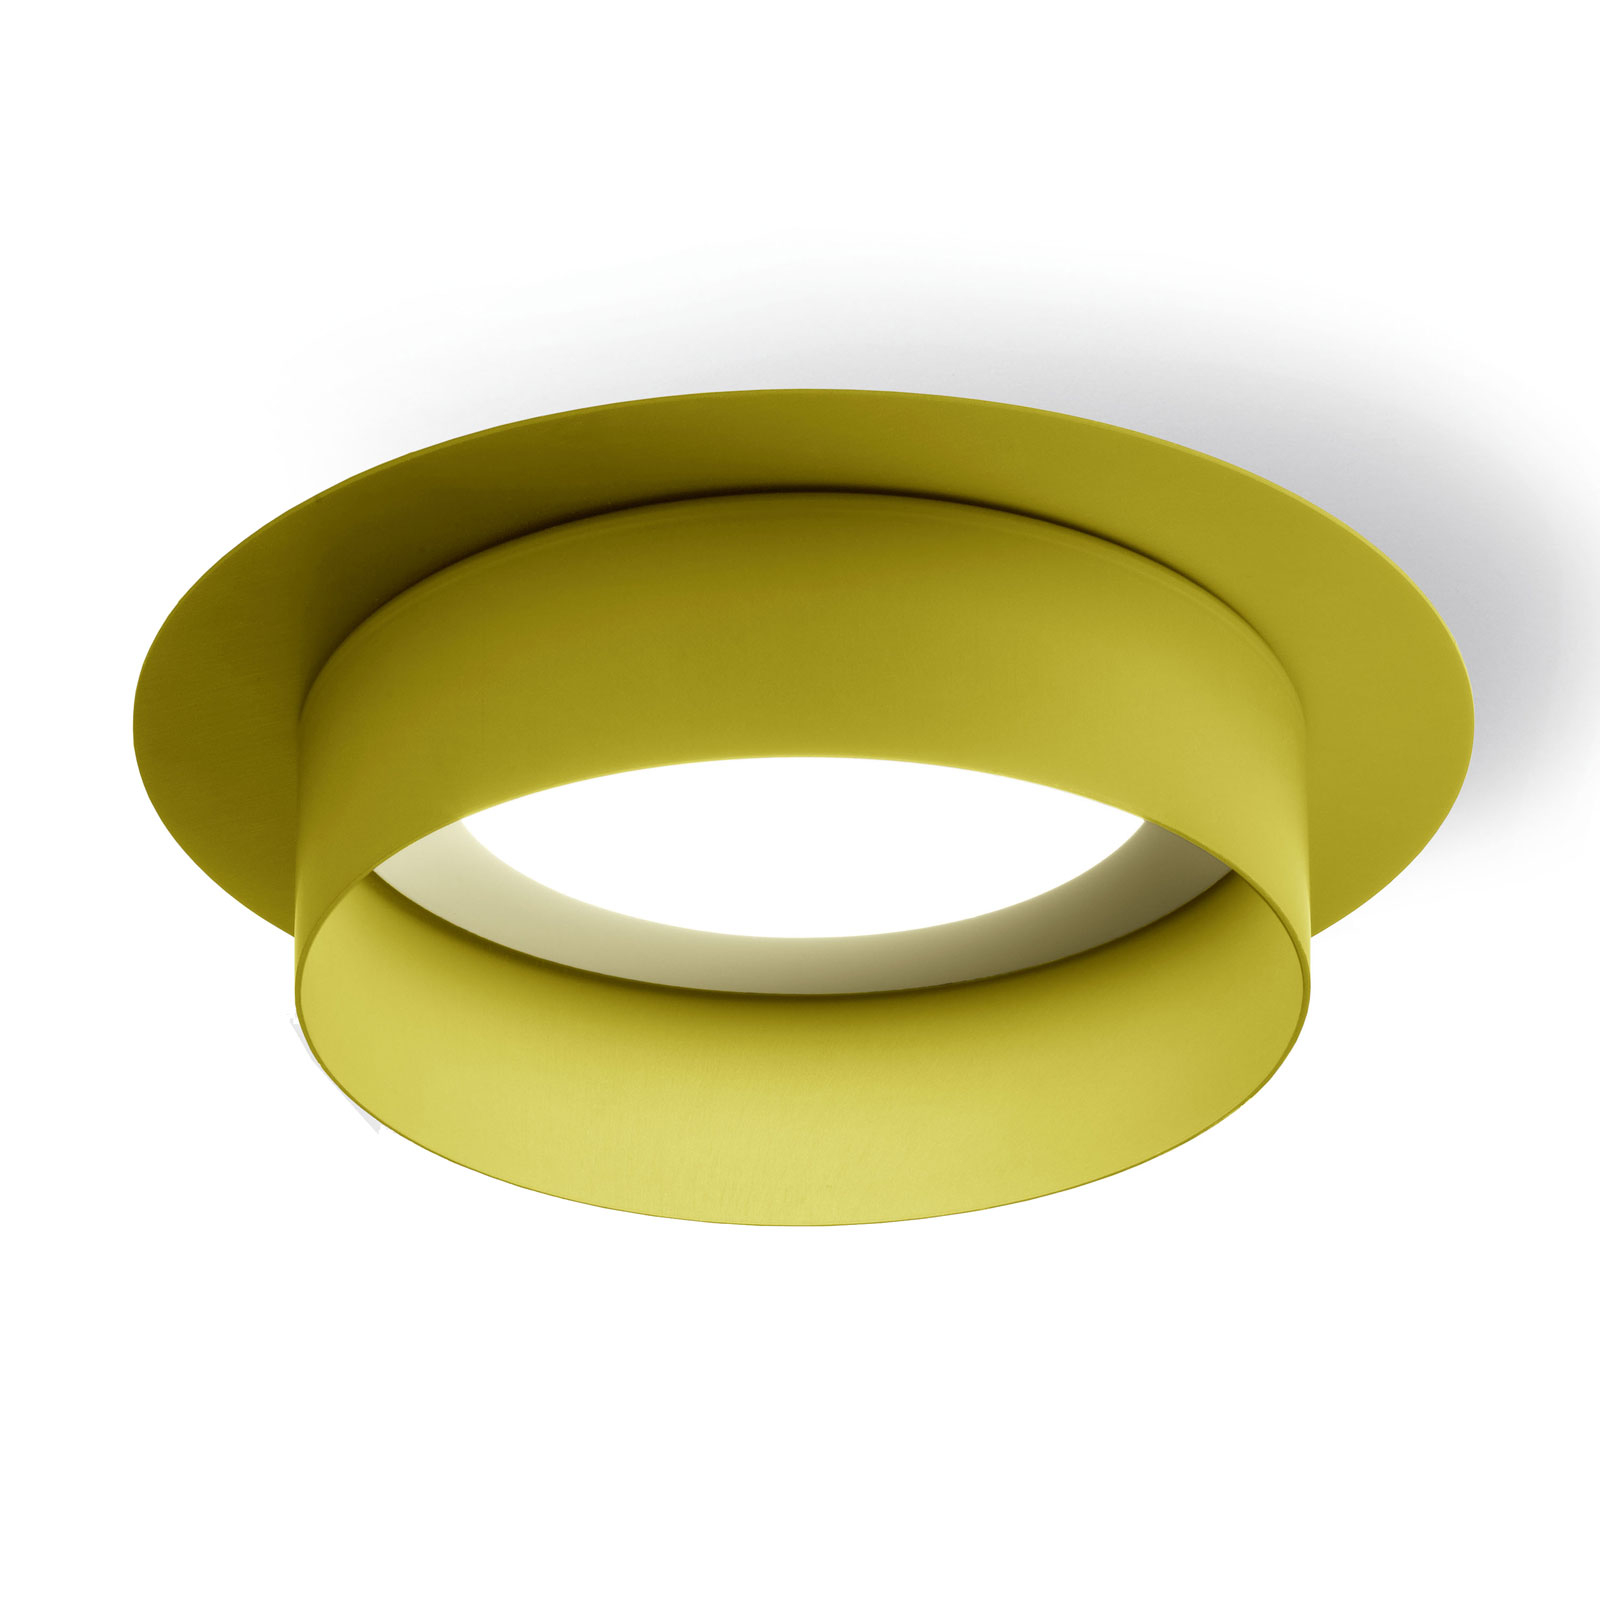 Modo Luce Hamer plafondlamp direct Ø 18 cm limone